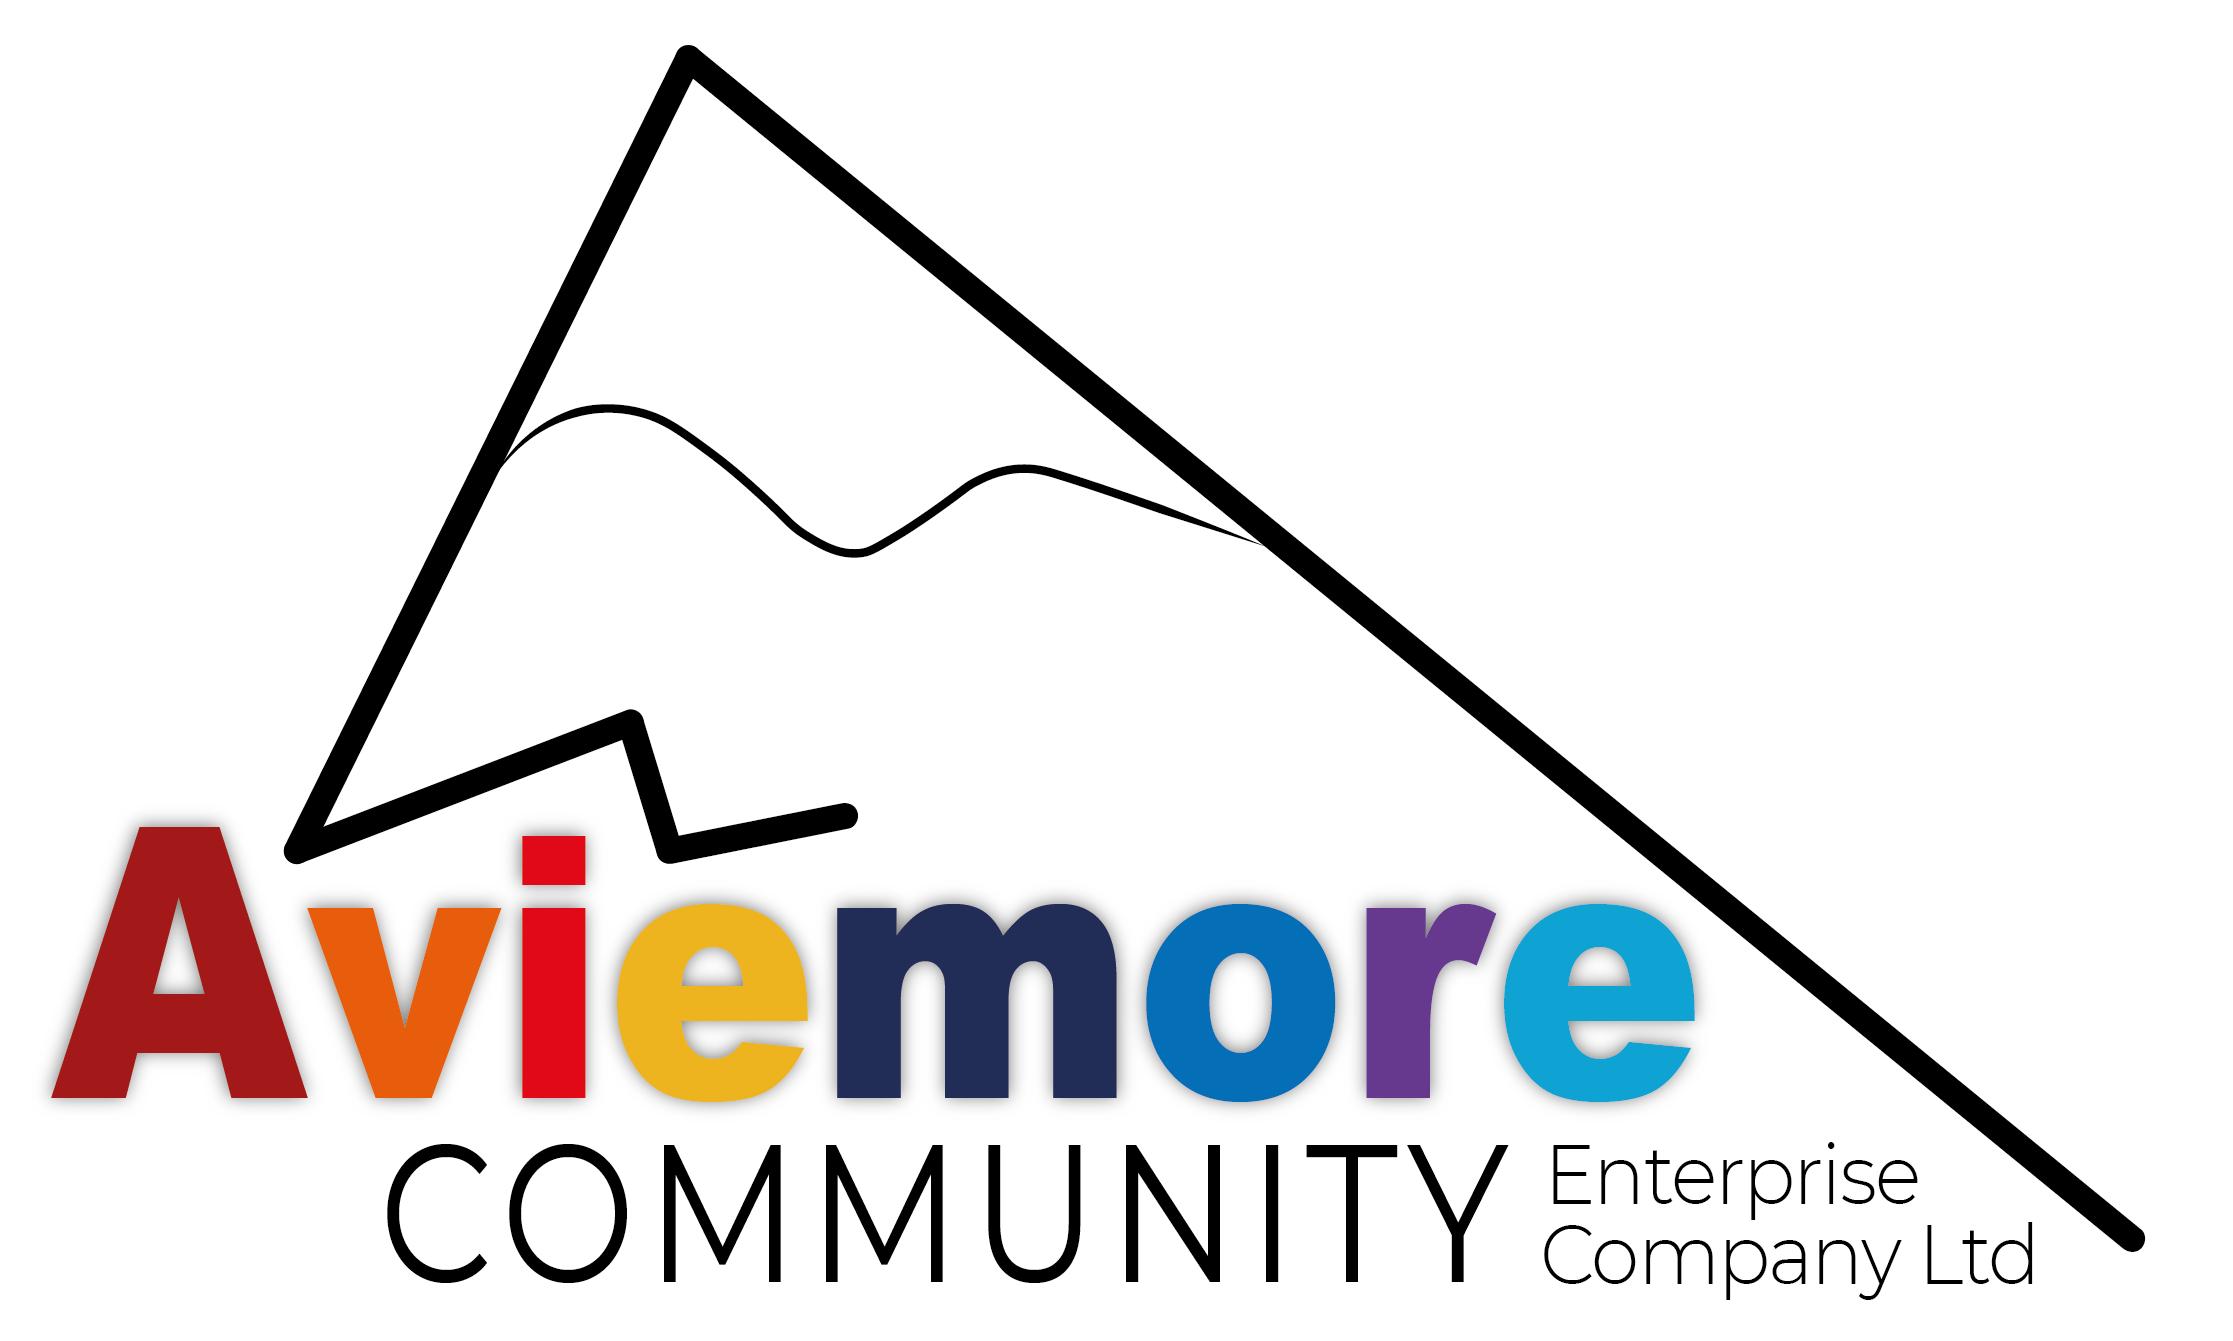 Aviemore Community Enterprise